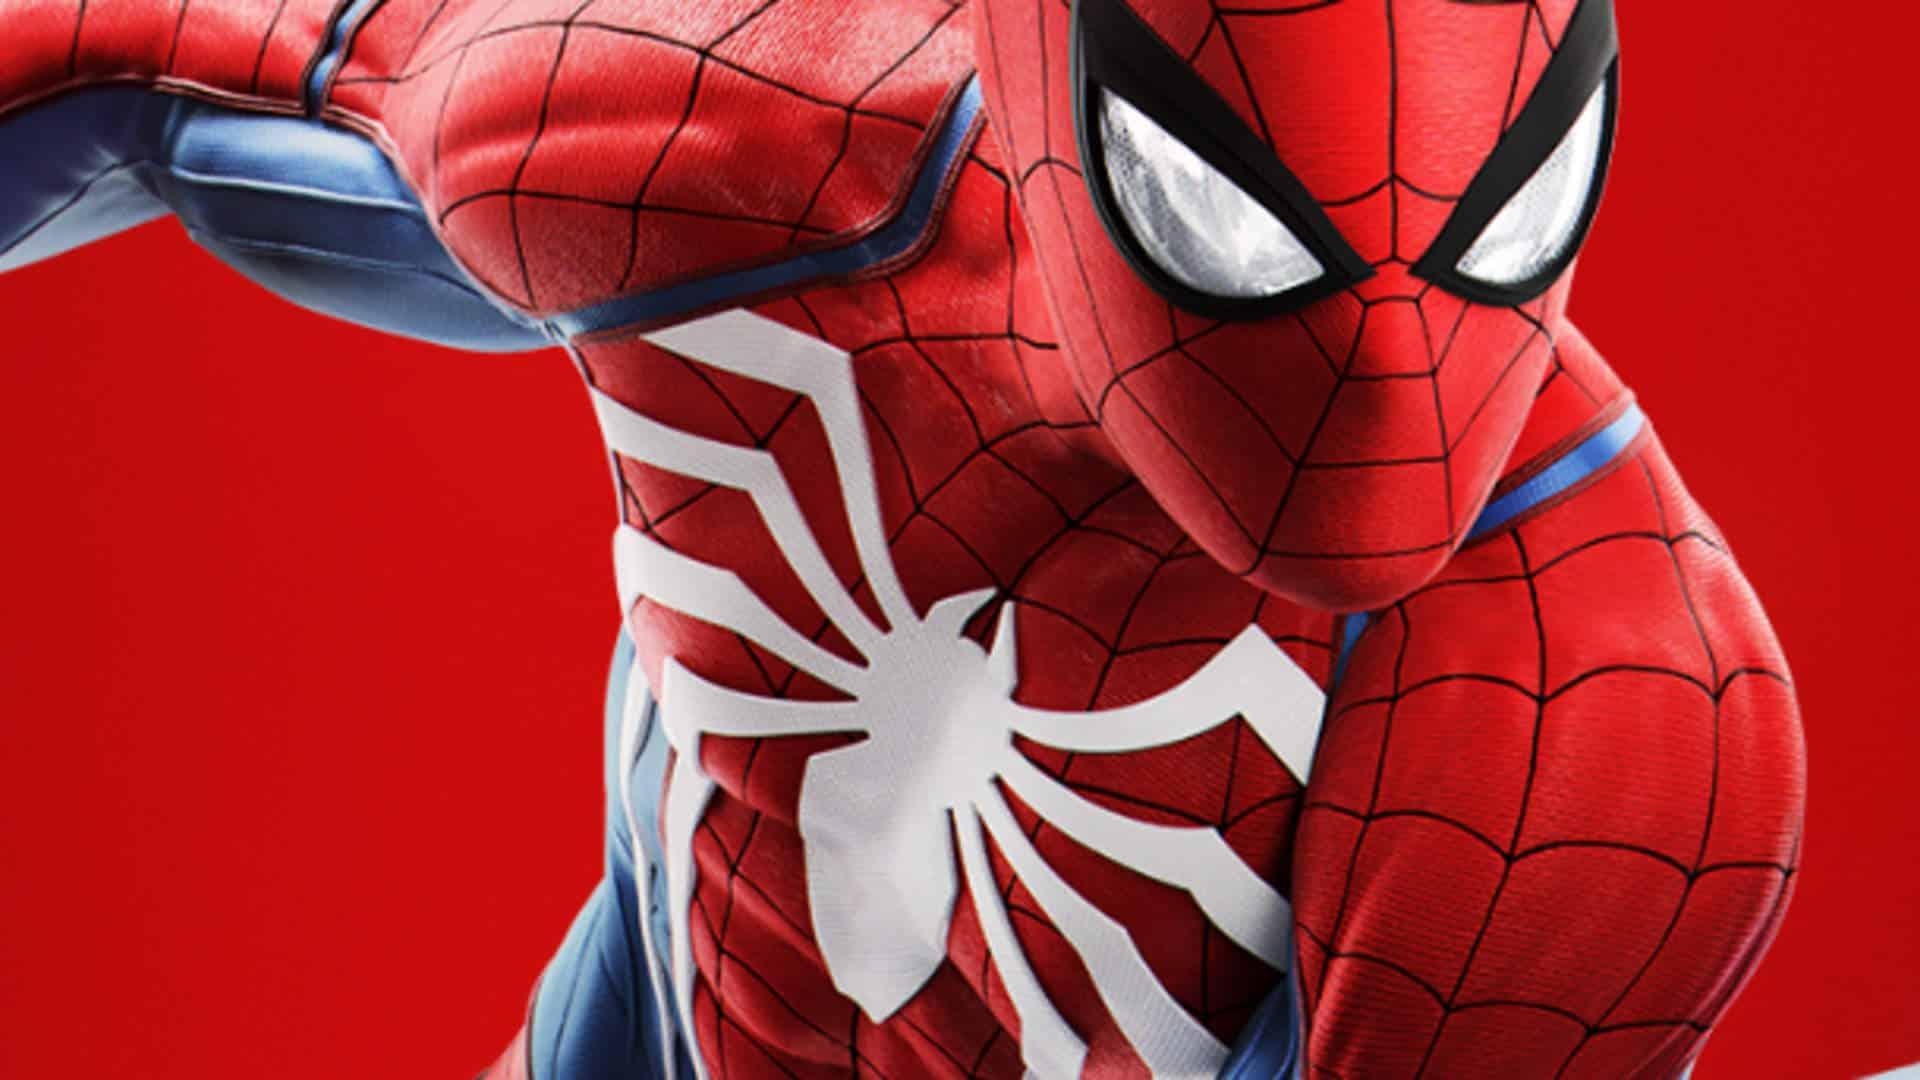 Marvels Avengers Spider Man PS4 Marvel's Spider-Man: Miles Morales Save transfer